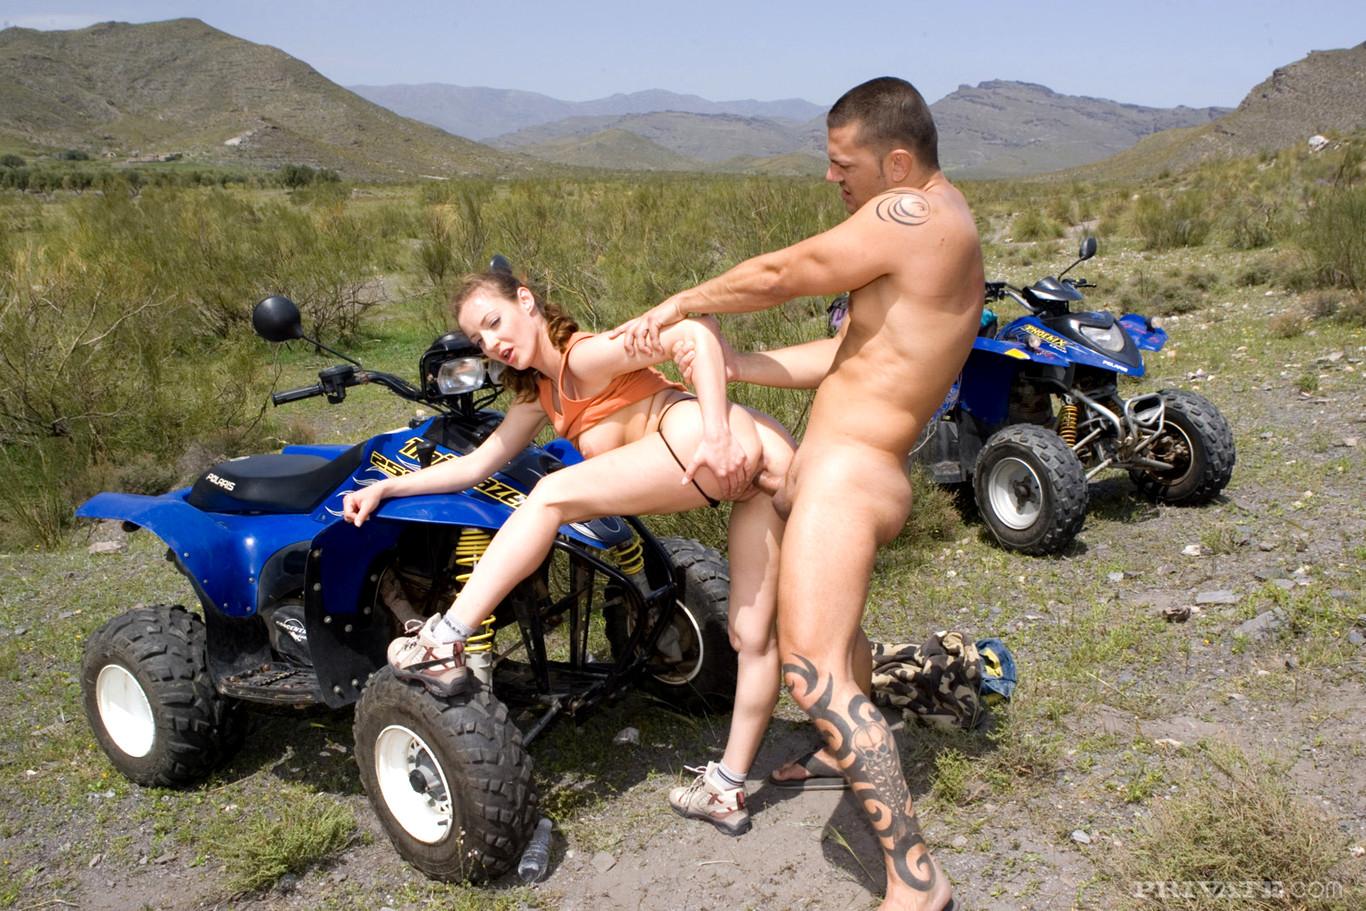 Русские байкеры секс на природе — pic 15